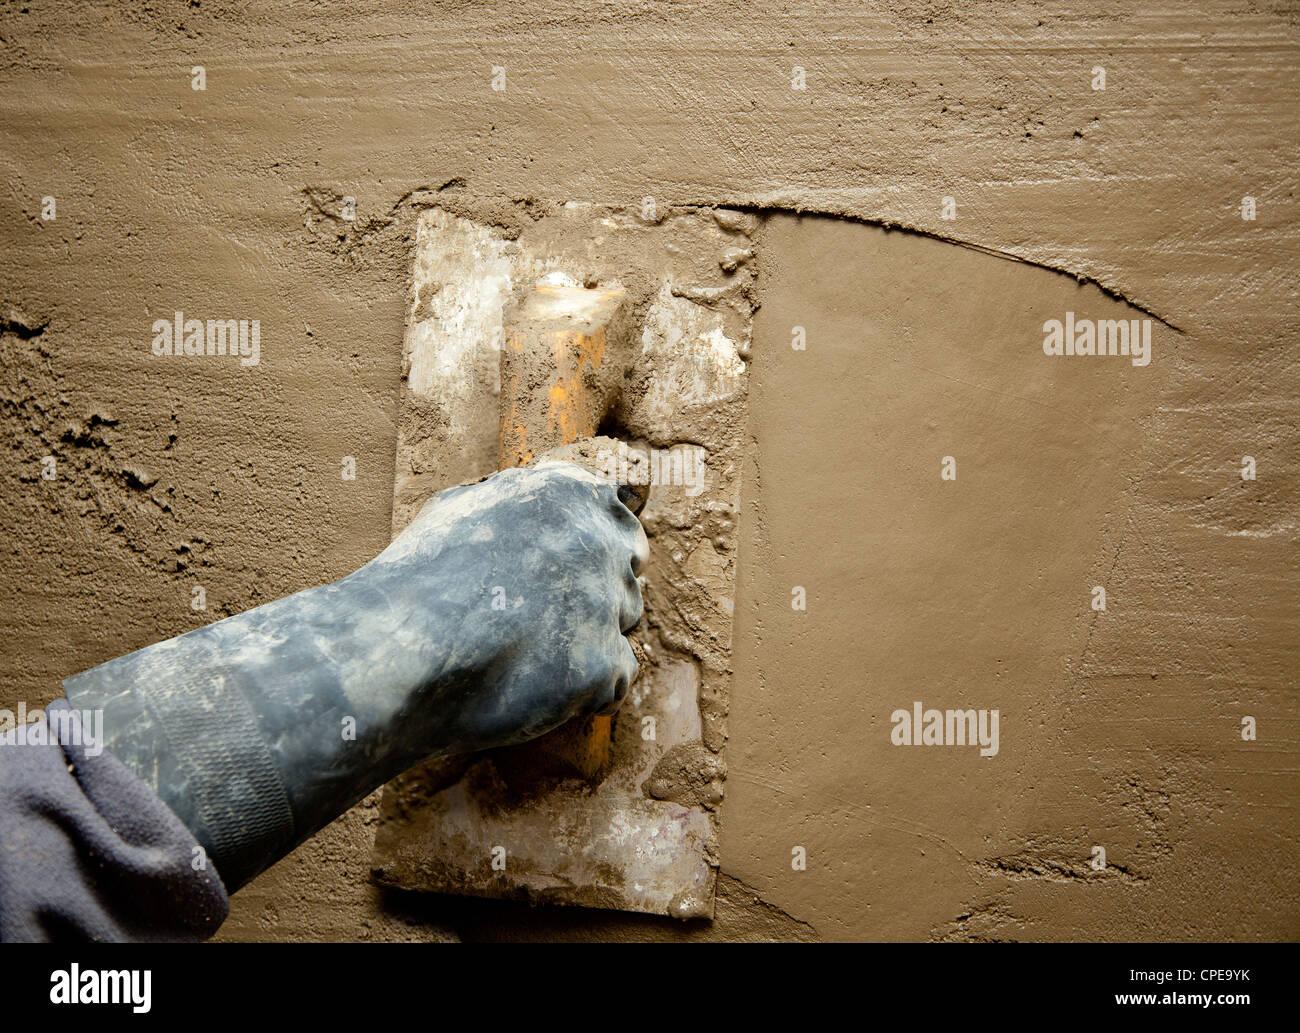 hand trowel plastering concrete wall stockfotos hand trowel plastering concrete wall bilder. Black Bedroom Furniture Sets. Home Design Ideas